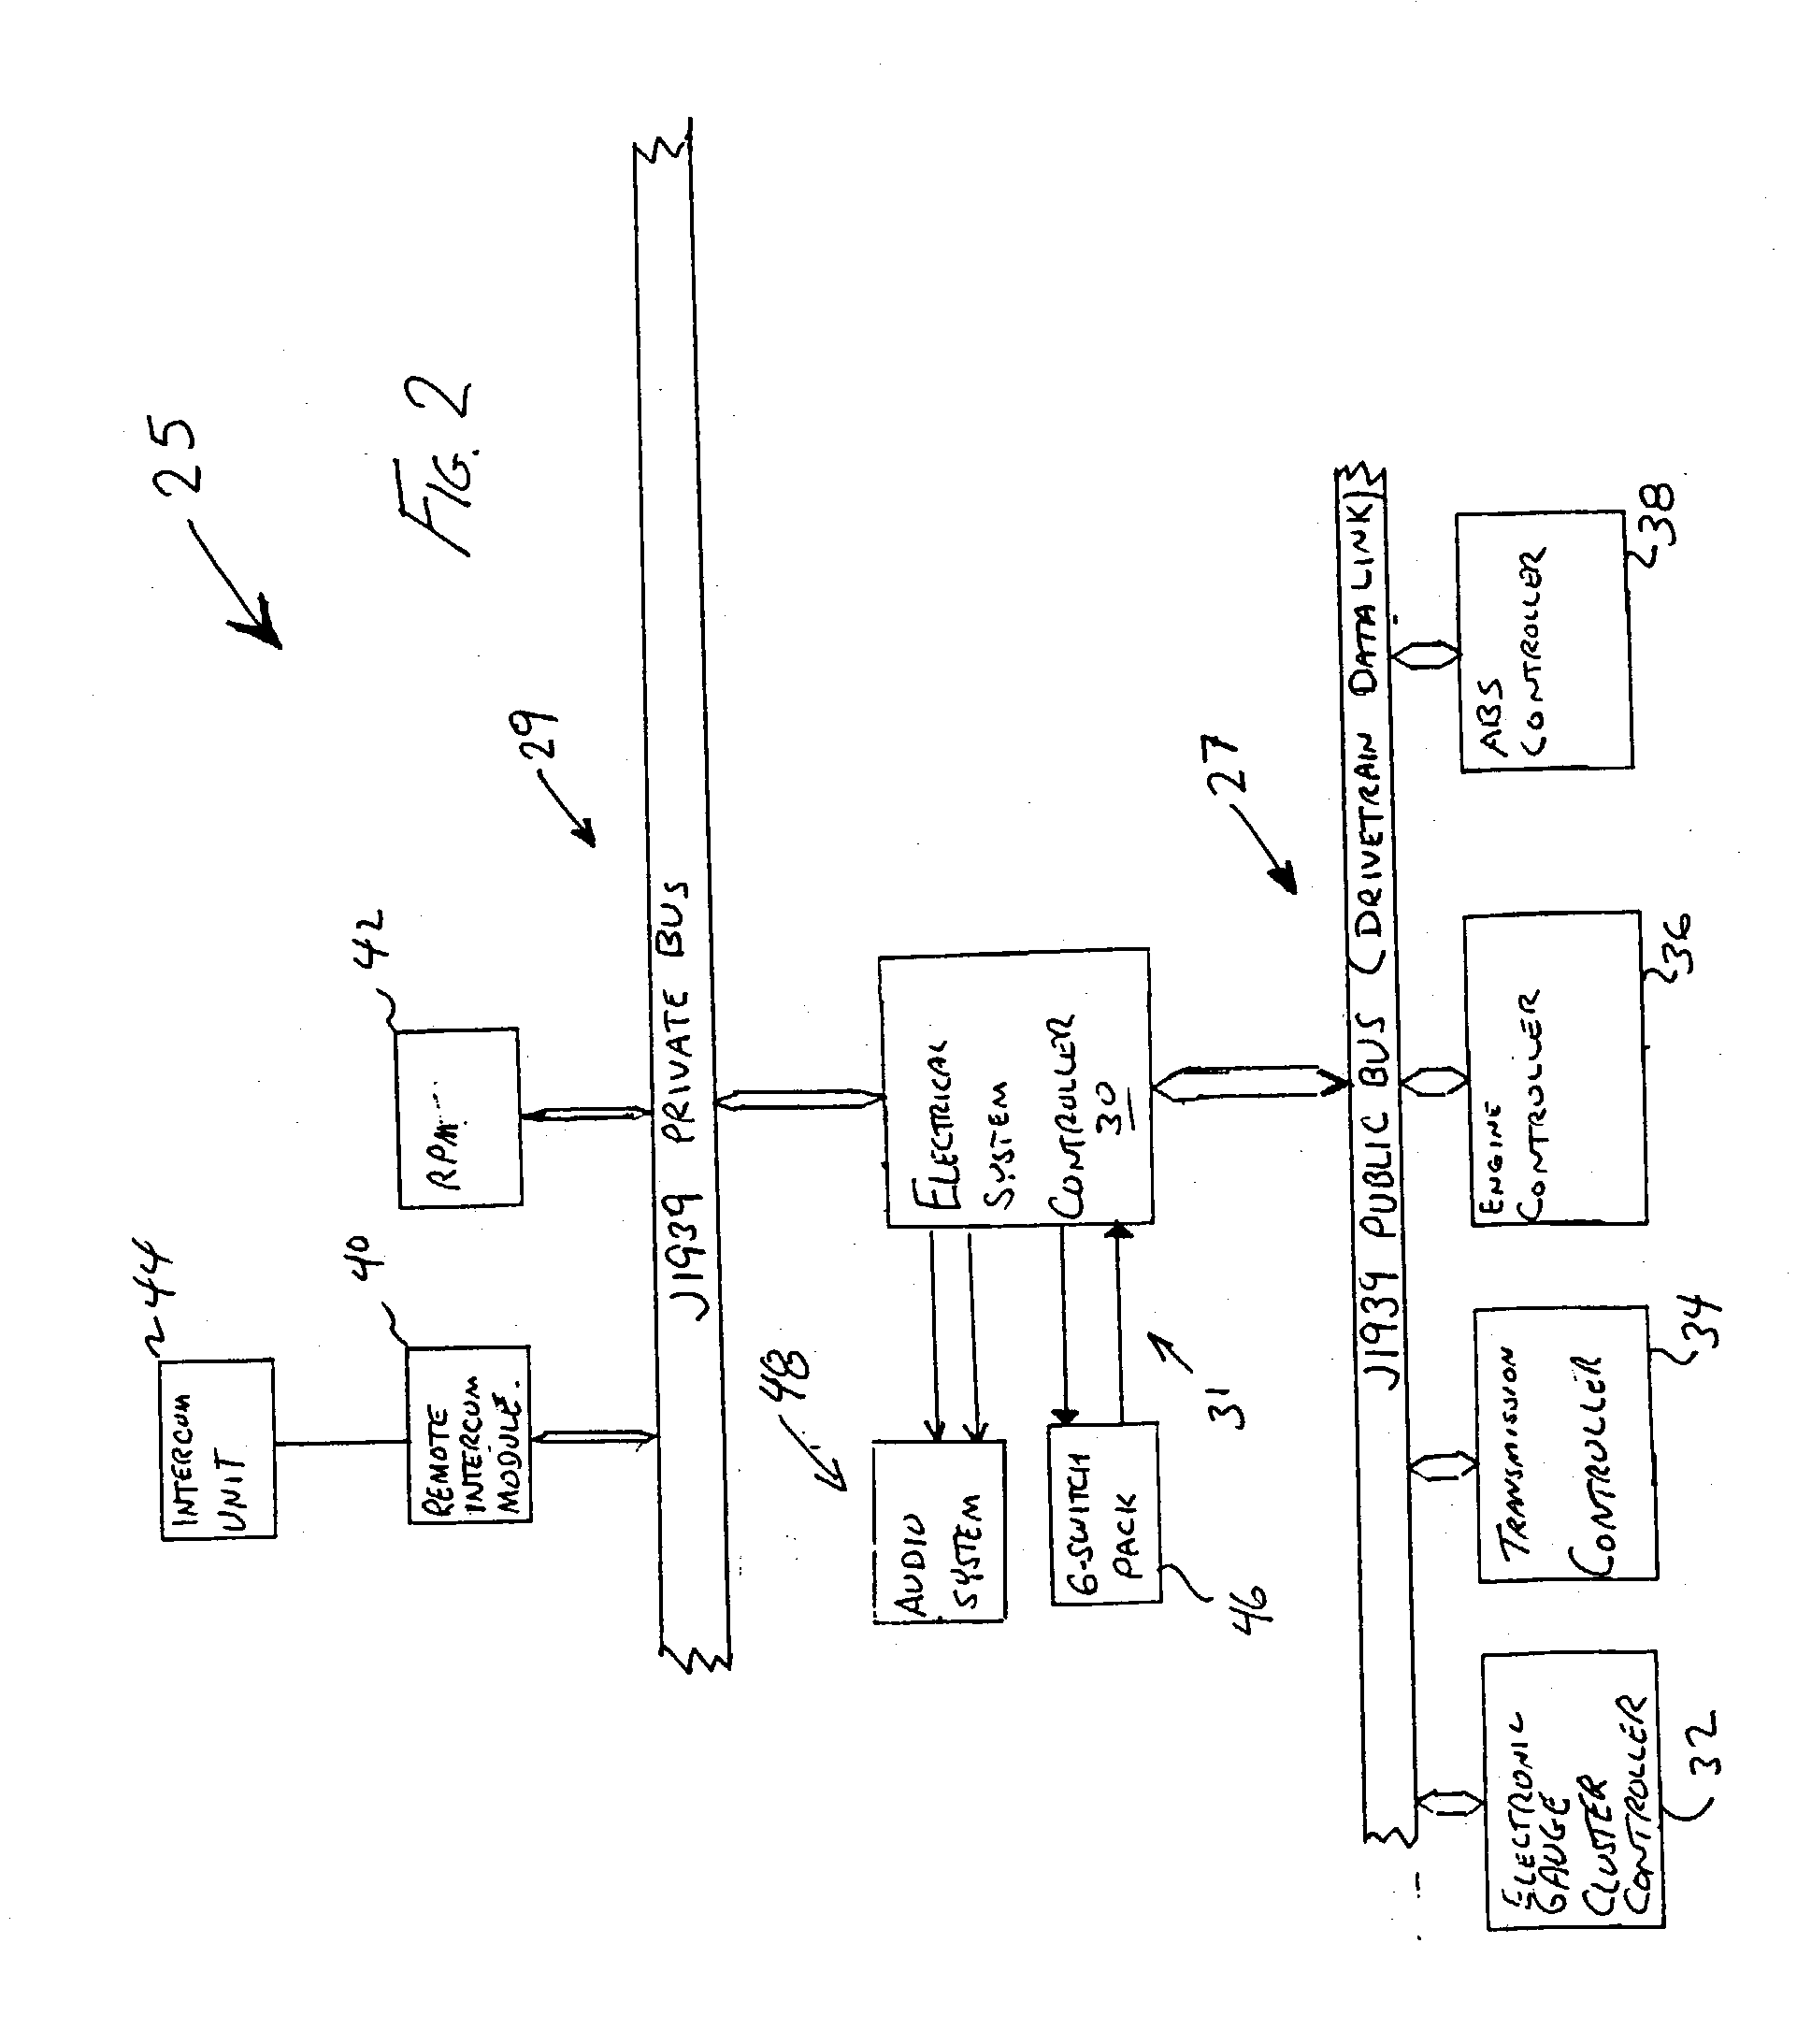 Wiring Intercom System